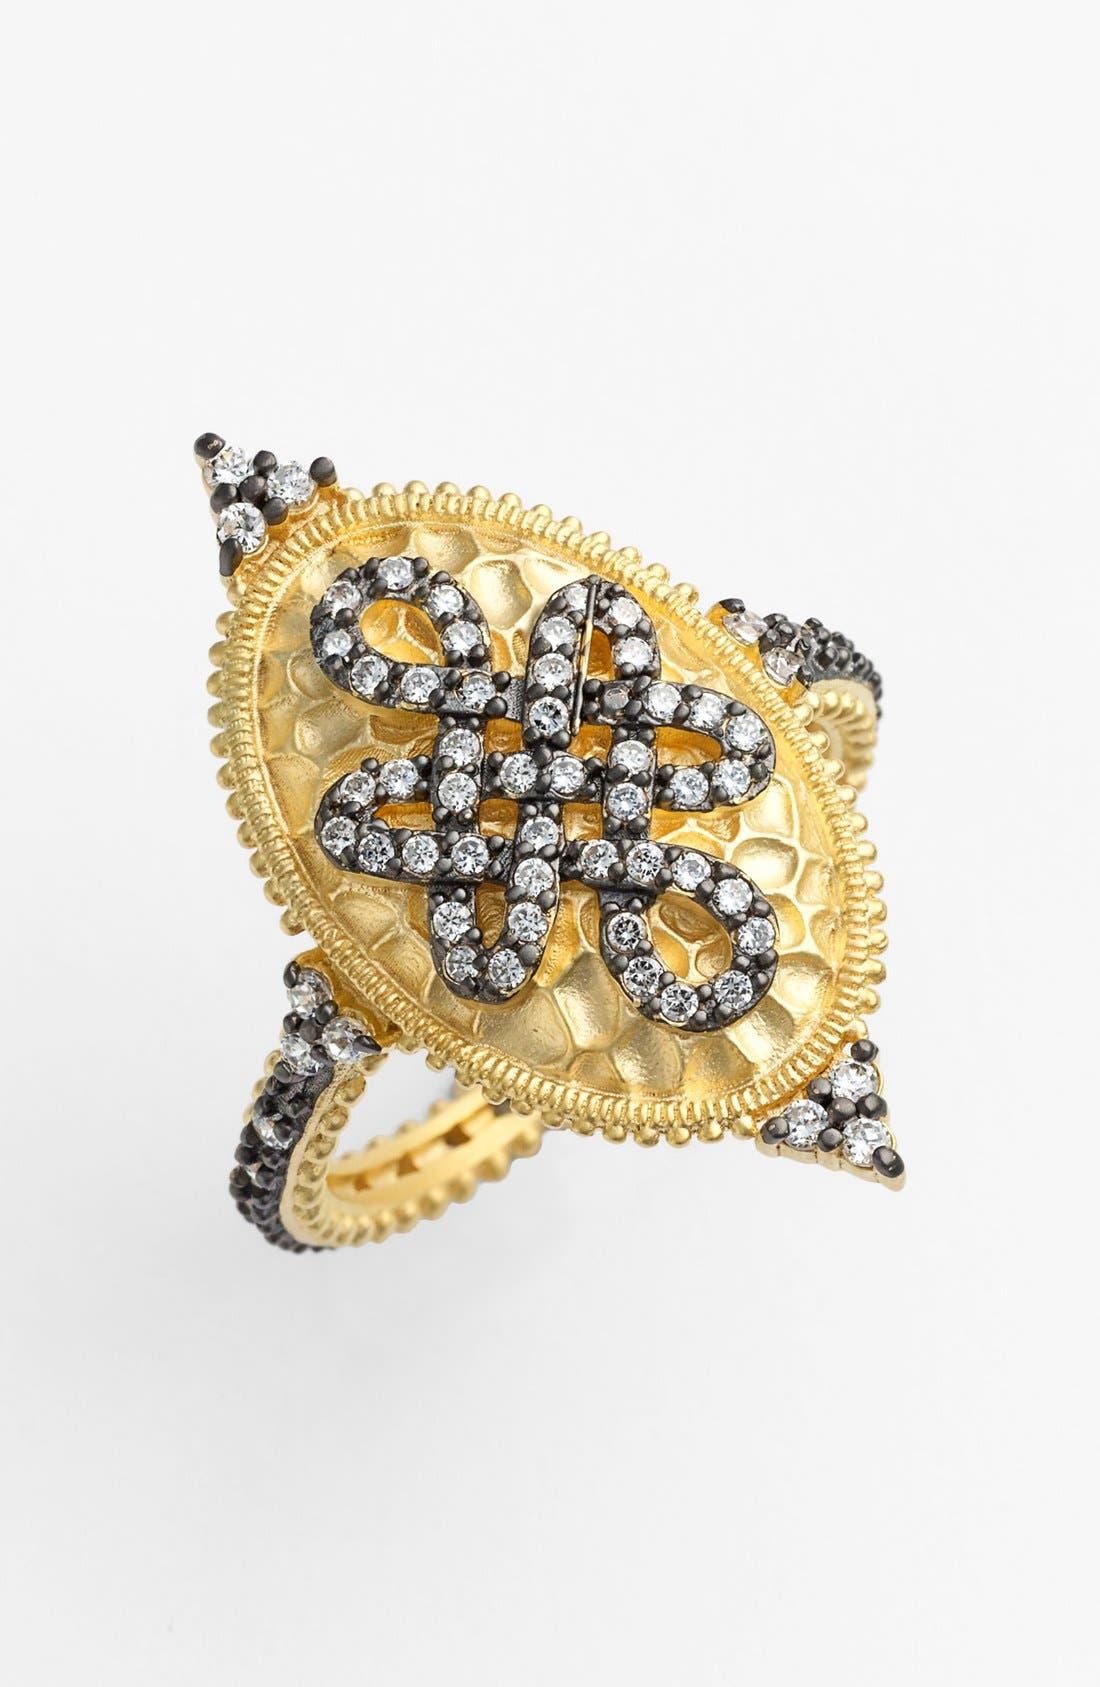 Alternate Image 1 Selected - FREIDA ROTHMAN 'Gramercy' Love Knot Oval Shield Ring